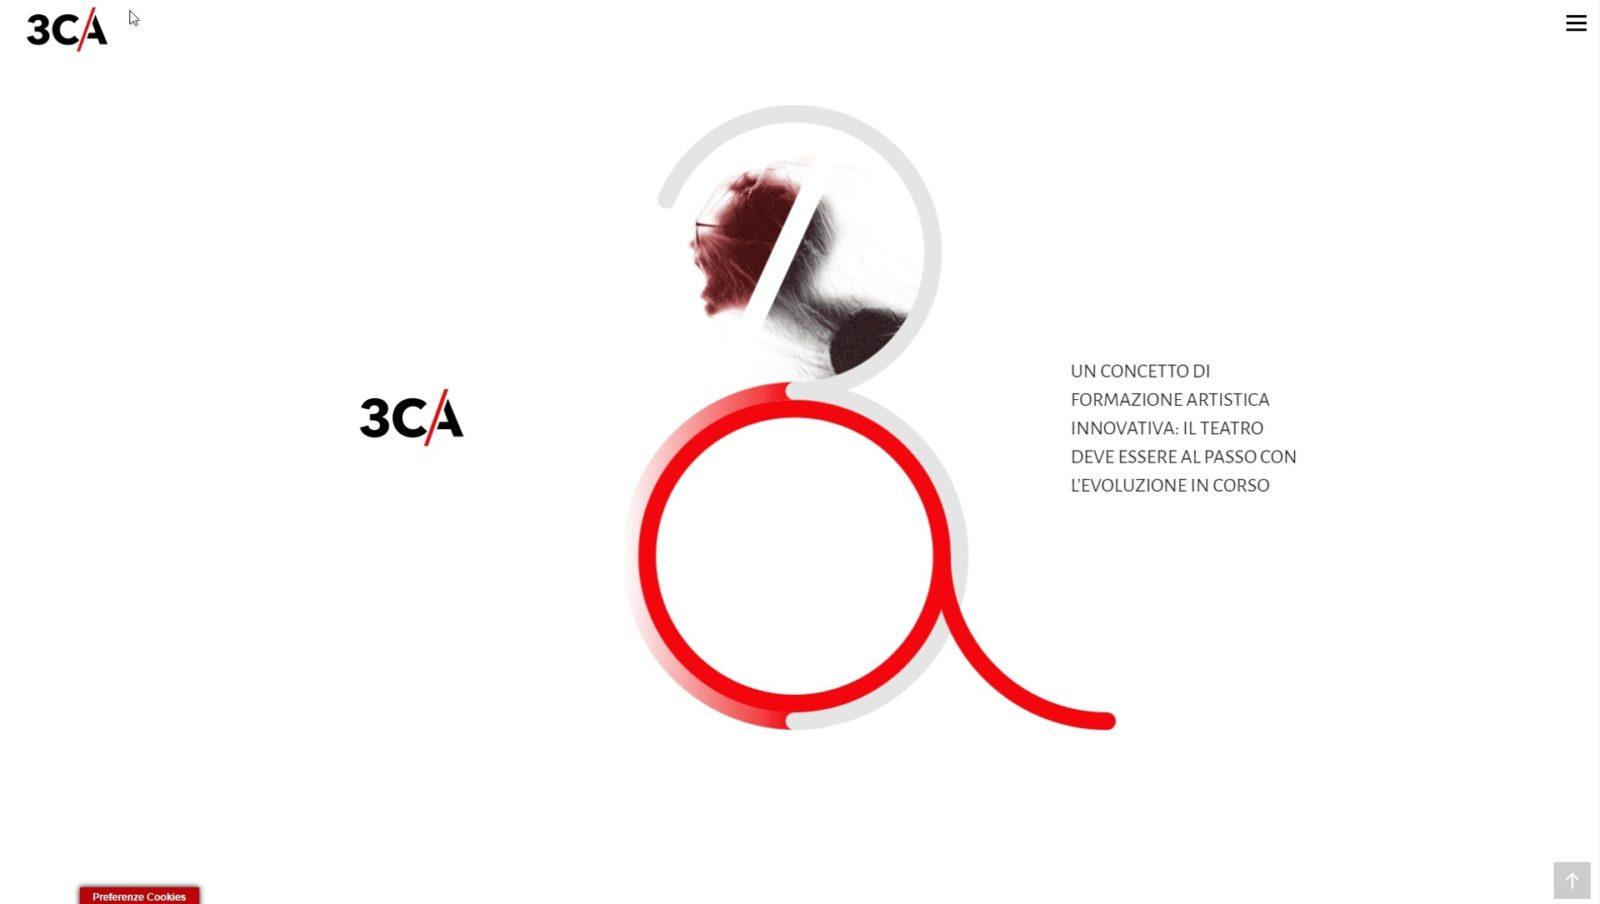 3C/A CORSO CREATIVO CONTEMPORANEO ATTORIALE – WEBSITE